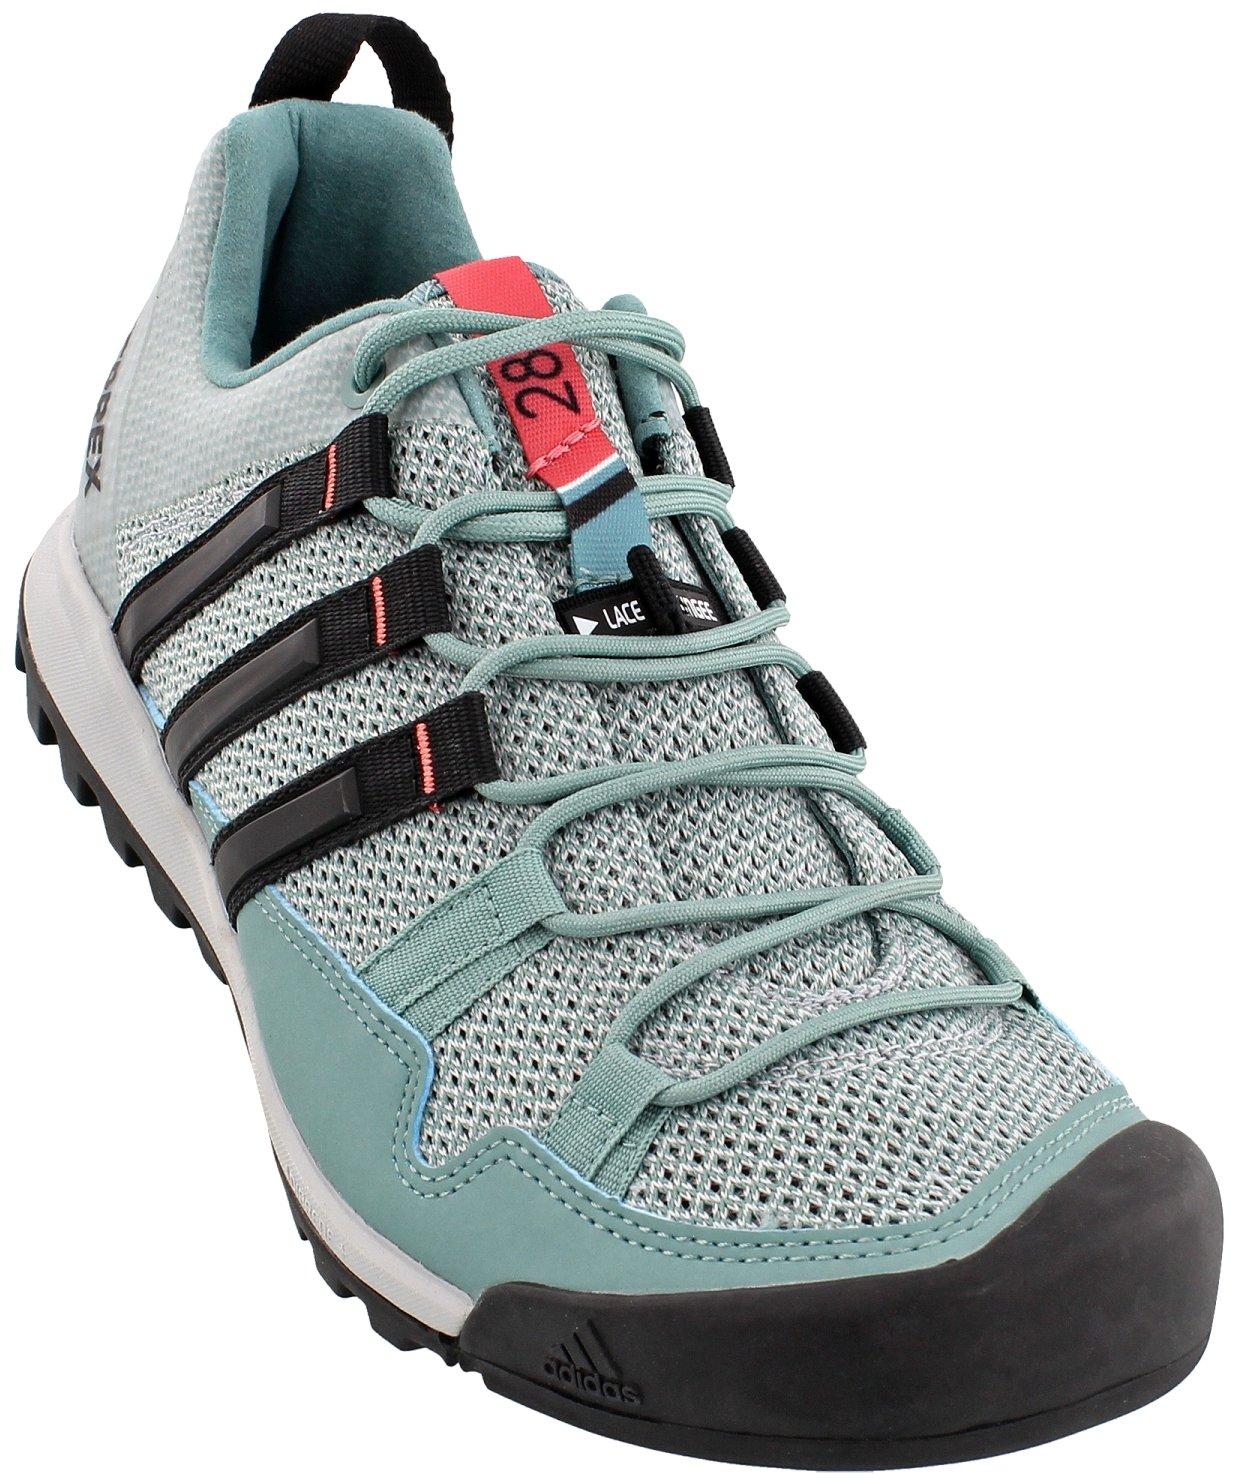 adidas outdoor Womens Terrex Solo Shoe (8 - Vapour Steel/Black/Tactile Pink)